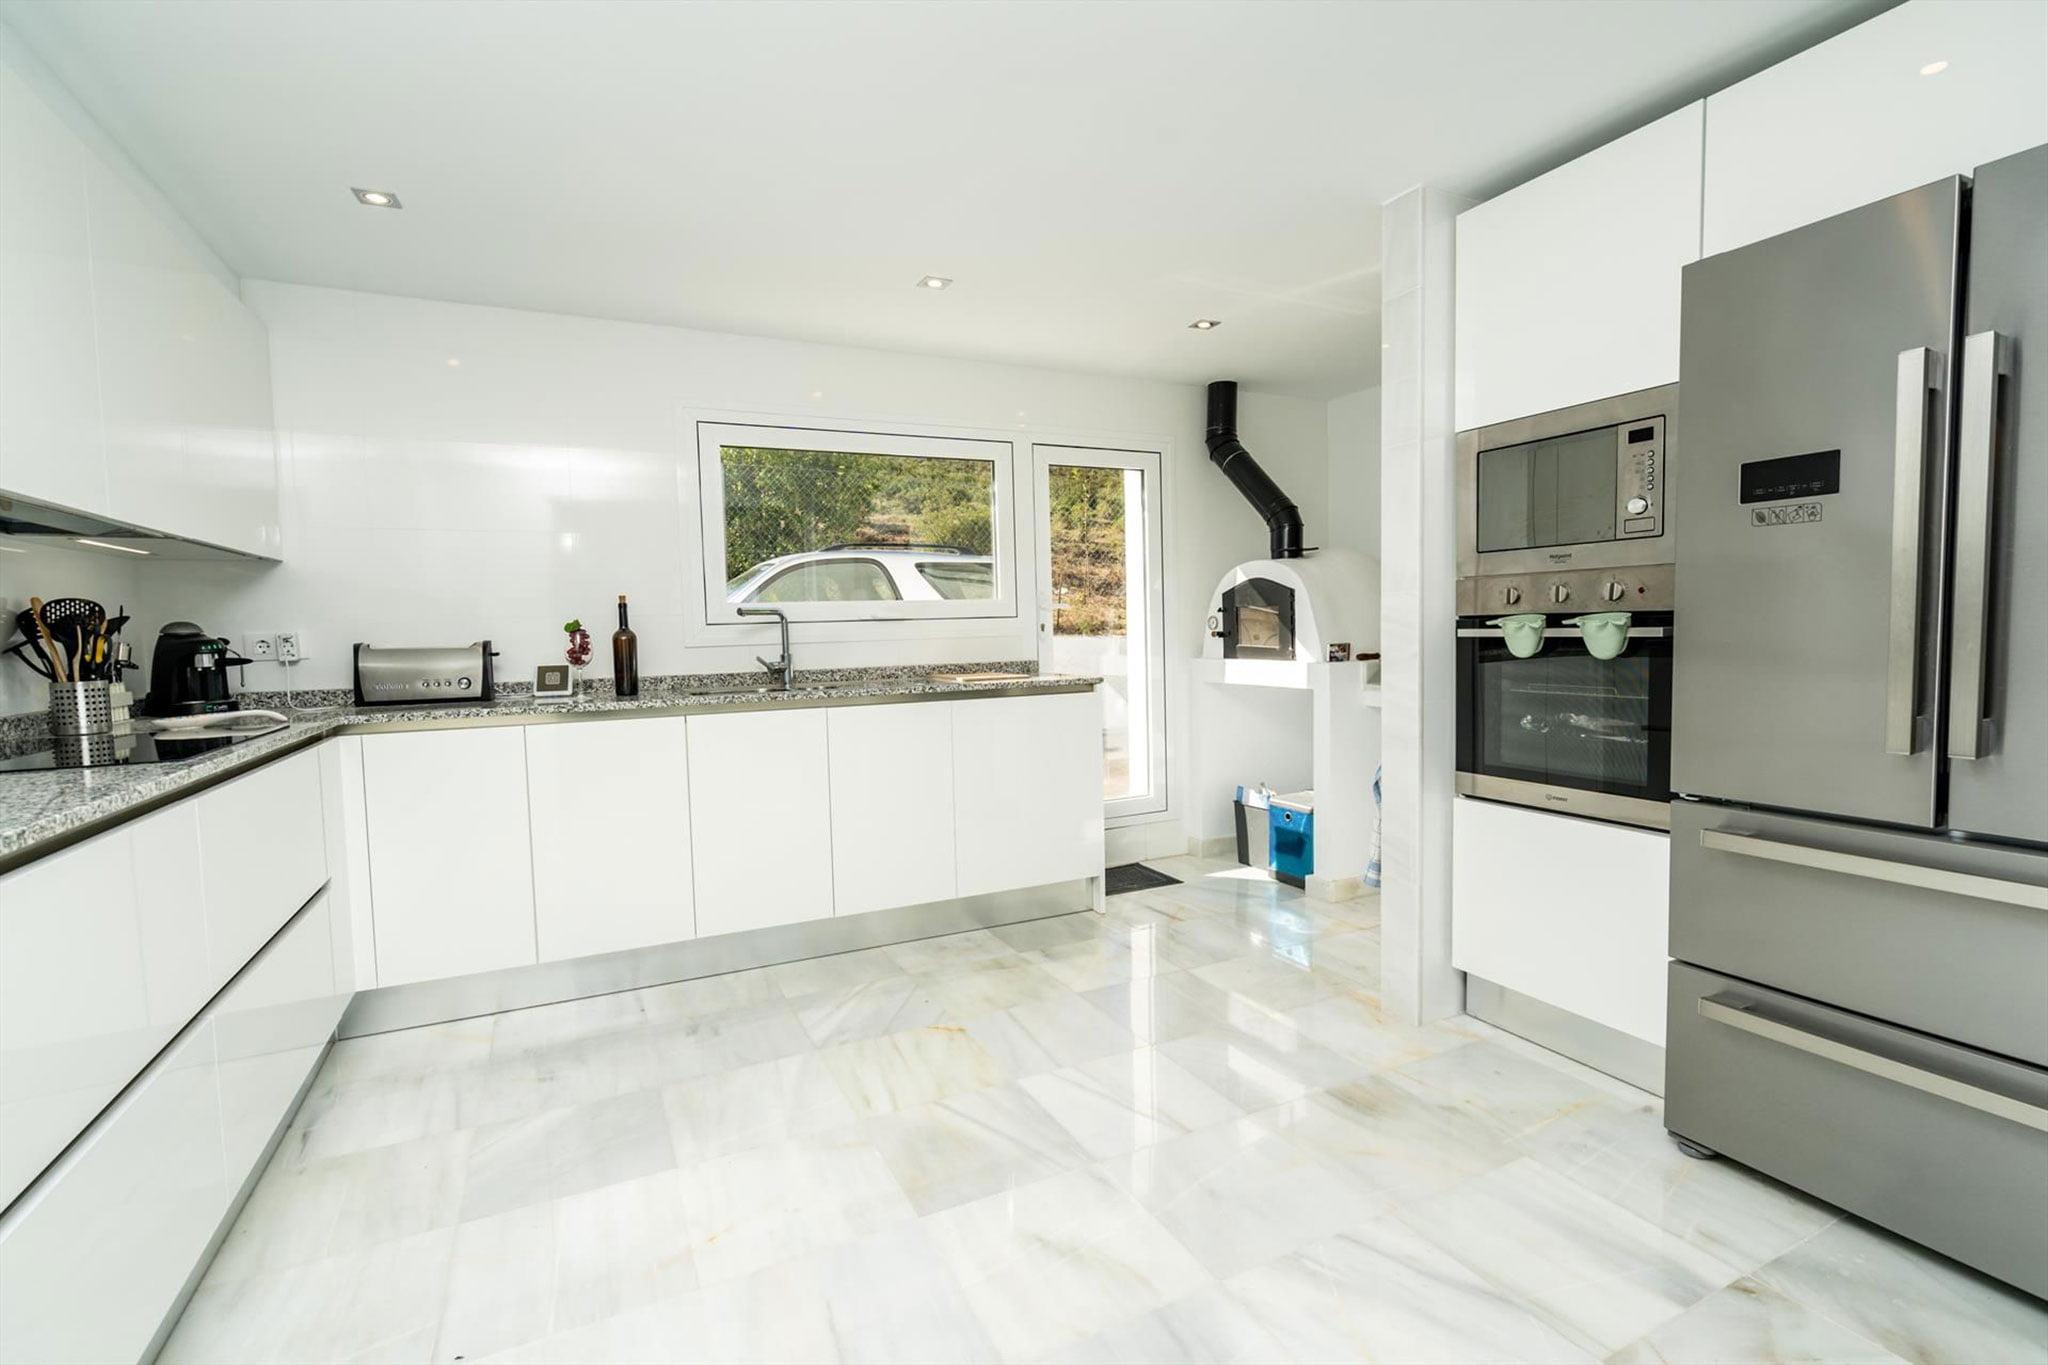 Cocina de una villa de alquiler vacacional en Jávea – Aguila Rent a Villa